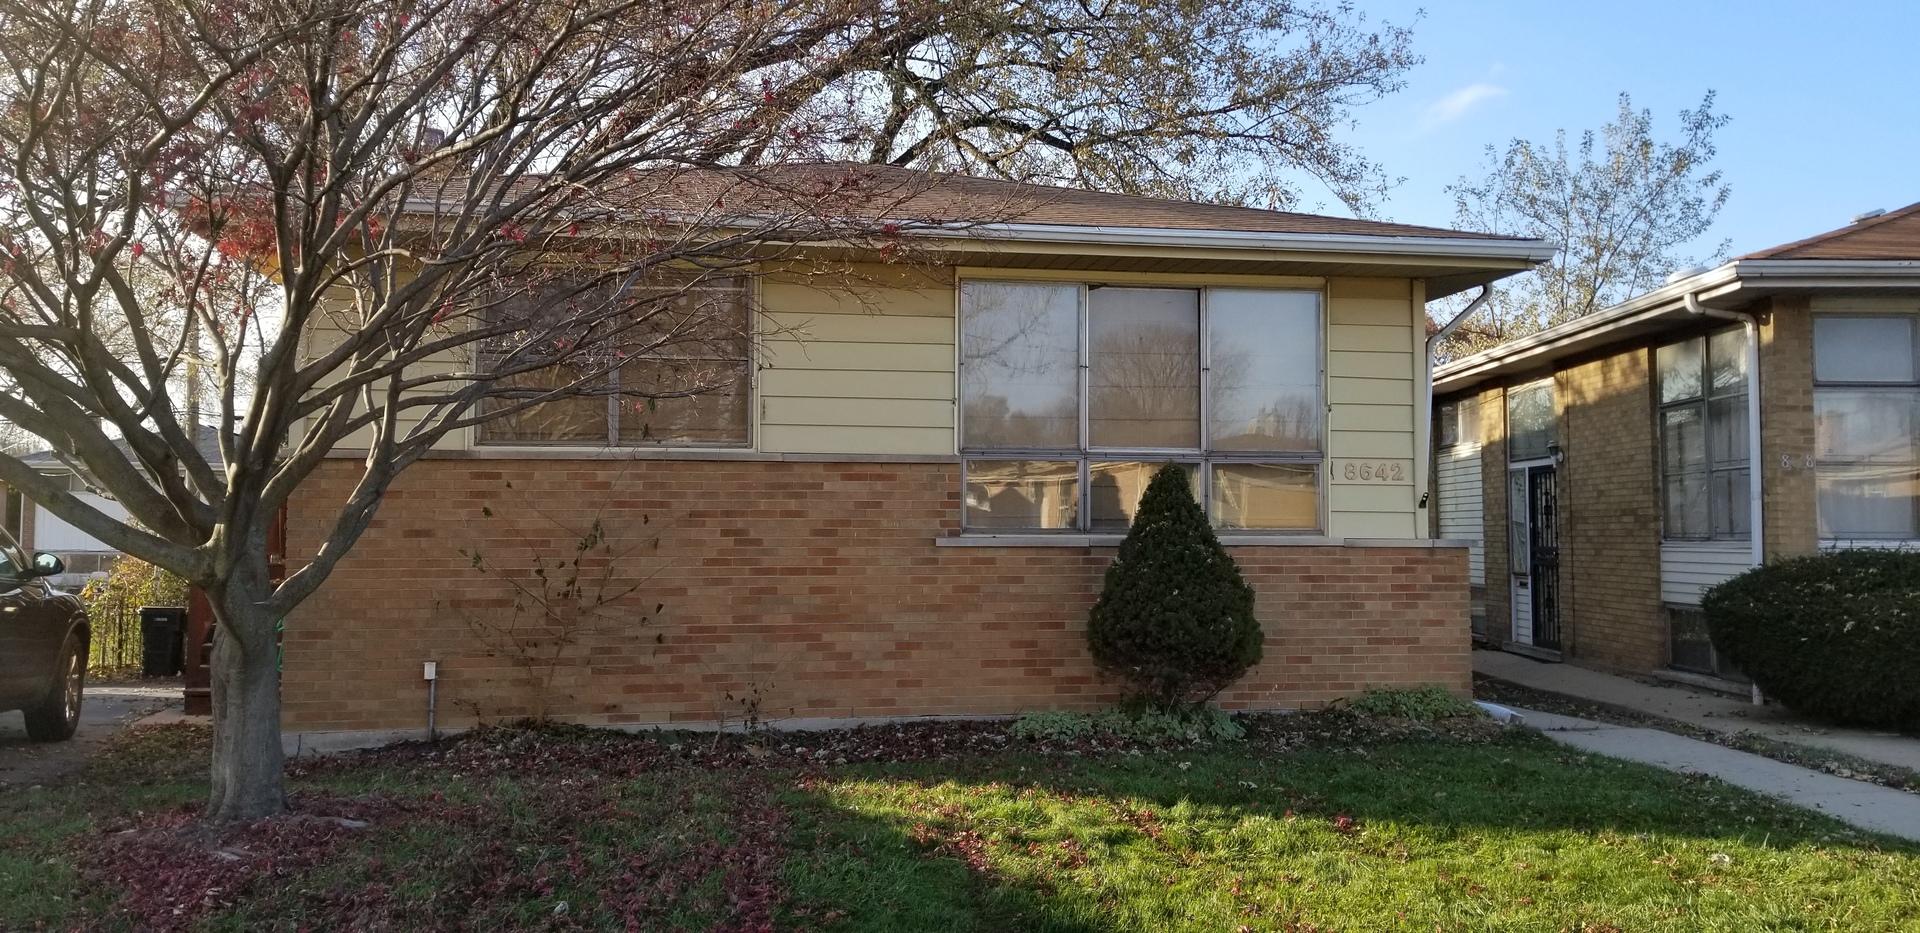 8642 S Kimbark Exterior Photo